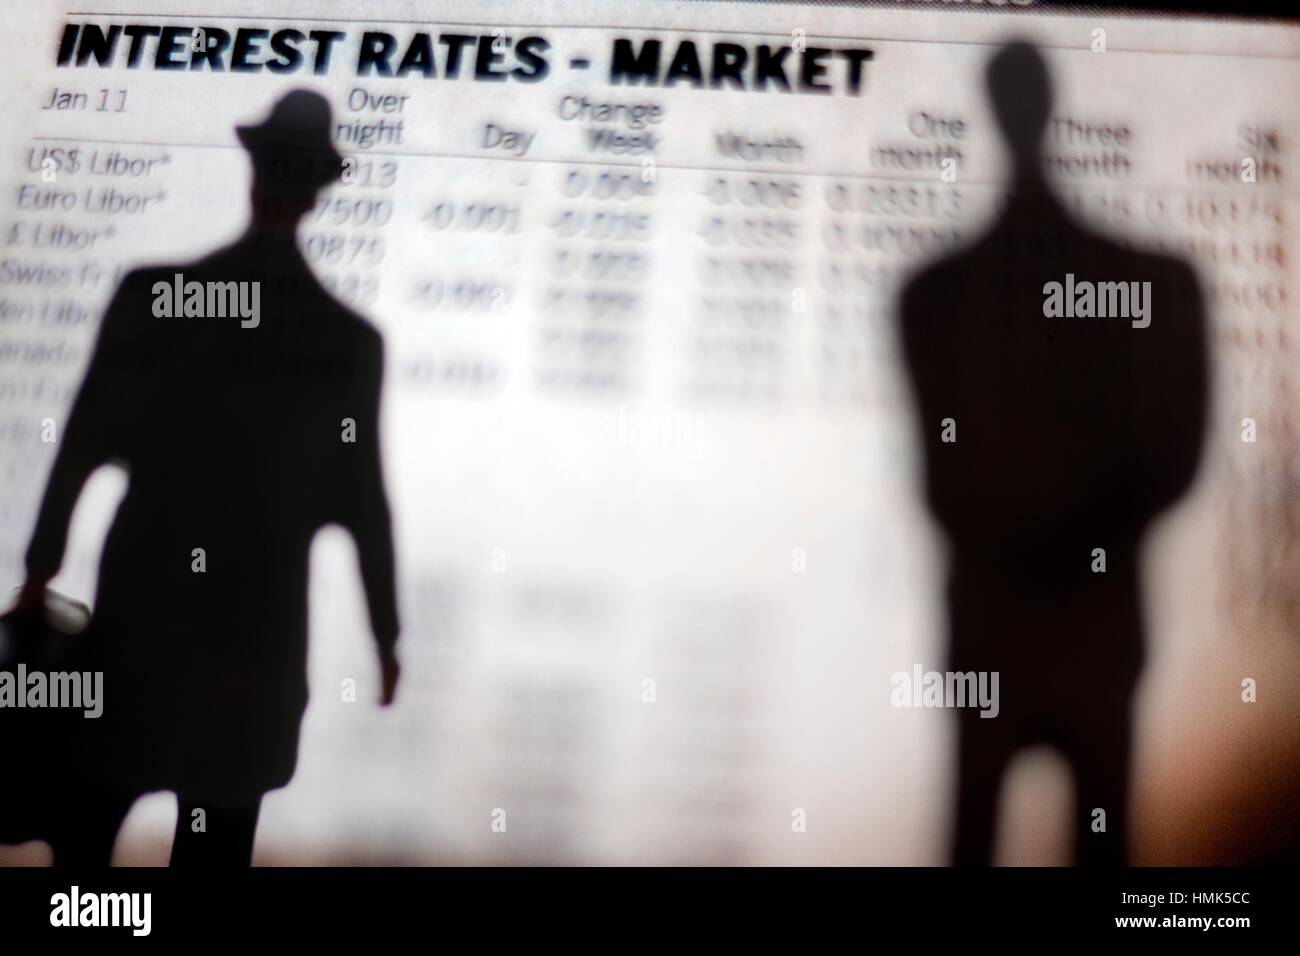 interest, rates, market, intereses, mercado. Stock Photo